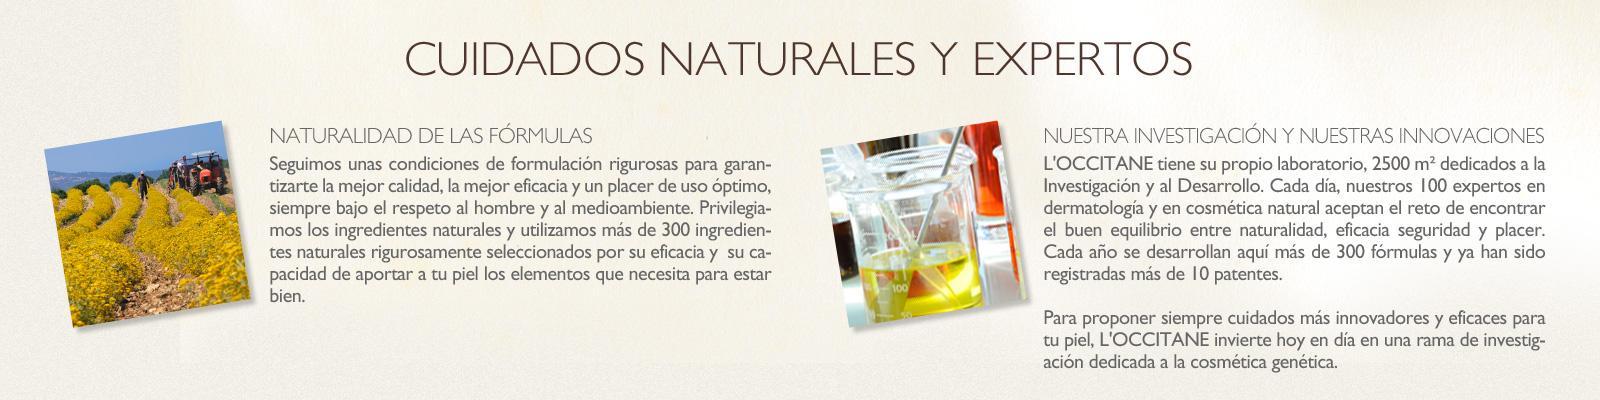 Cuidados naturales expertos - L'Occitane